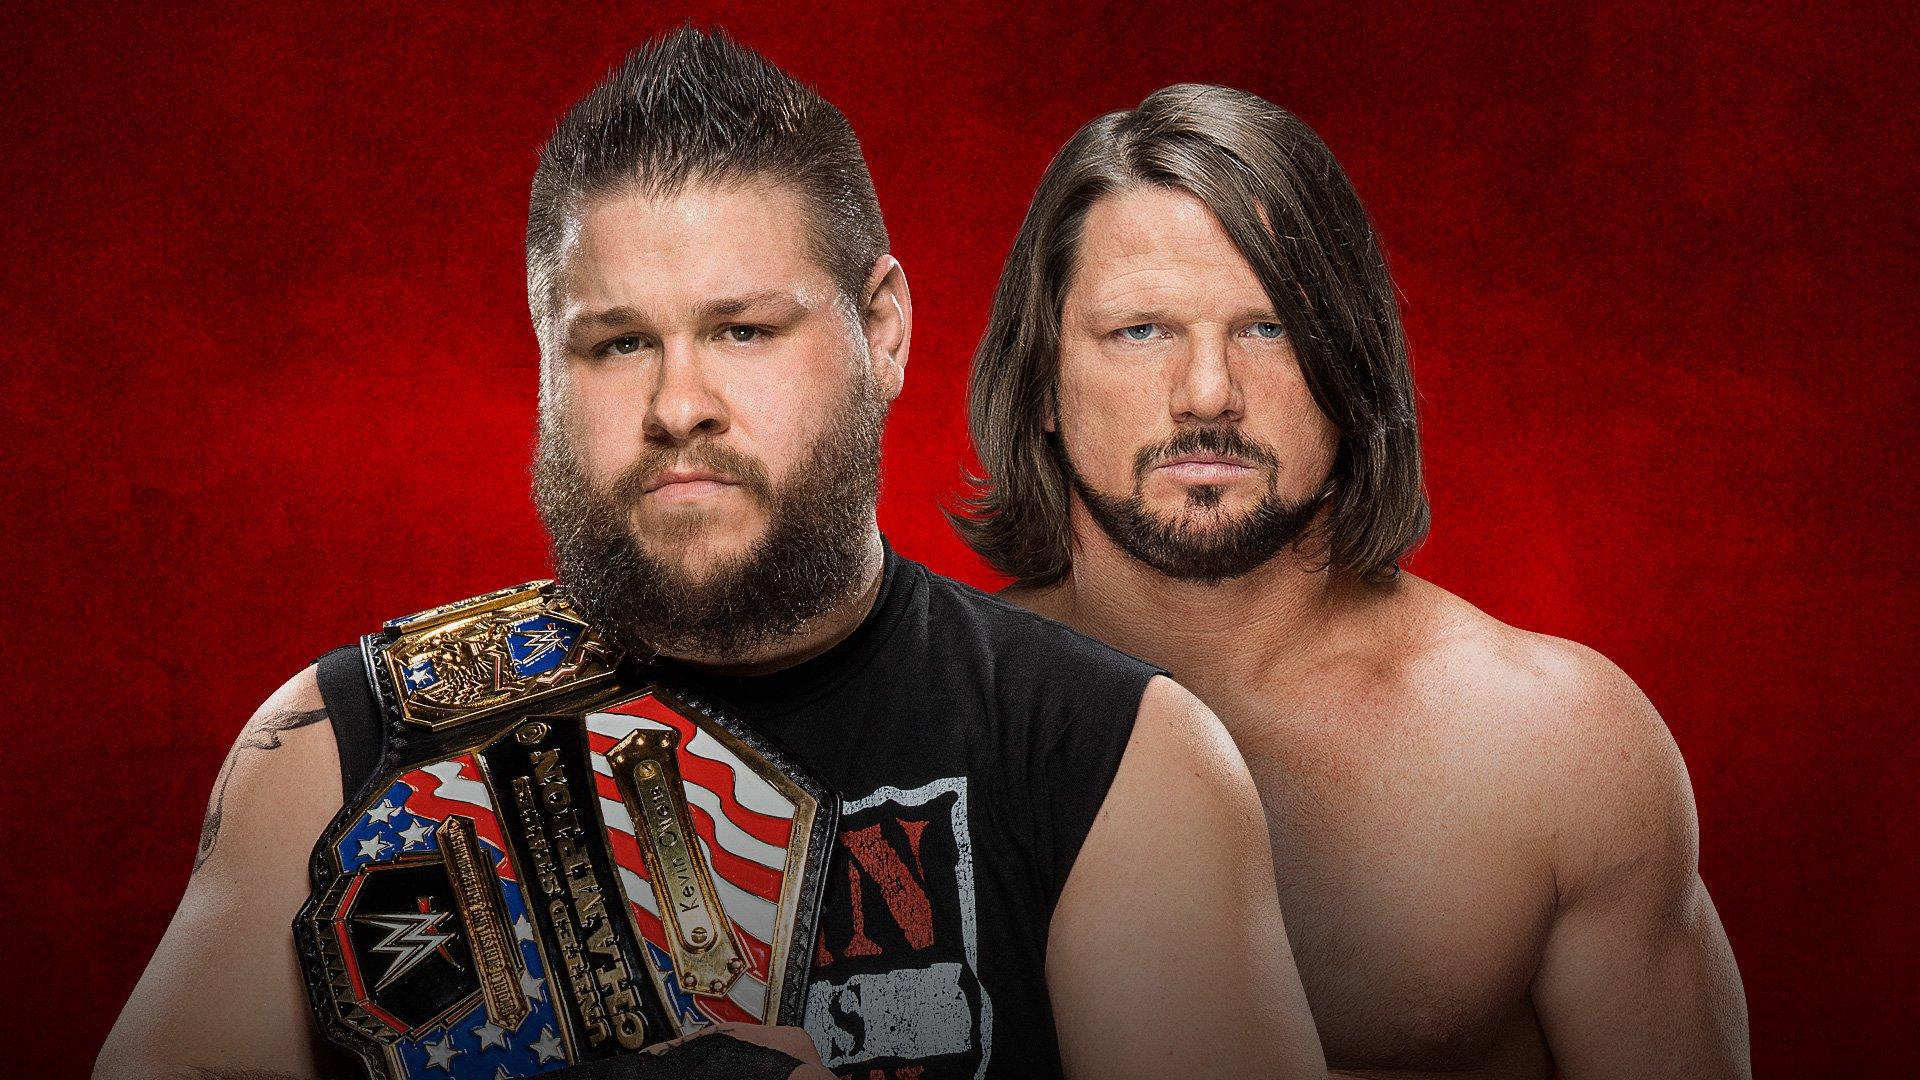 WWE Backlash 2017: Kevin Owens vs. AJ Styles